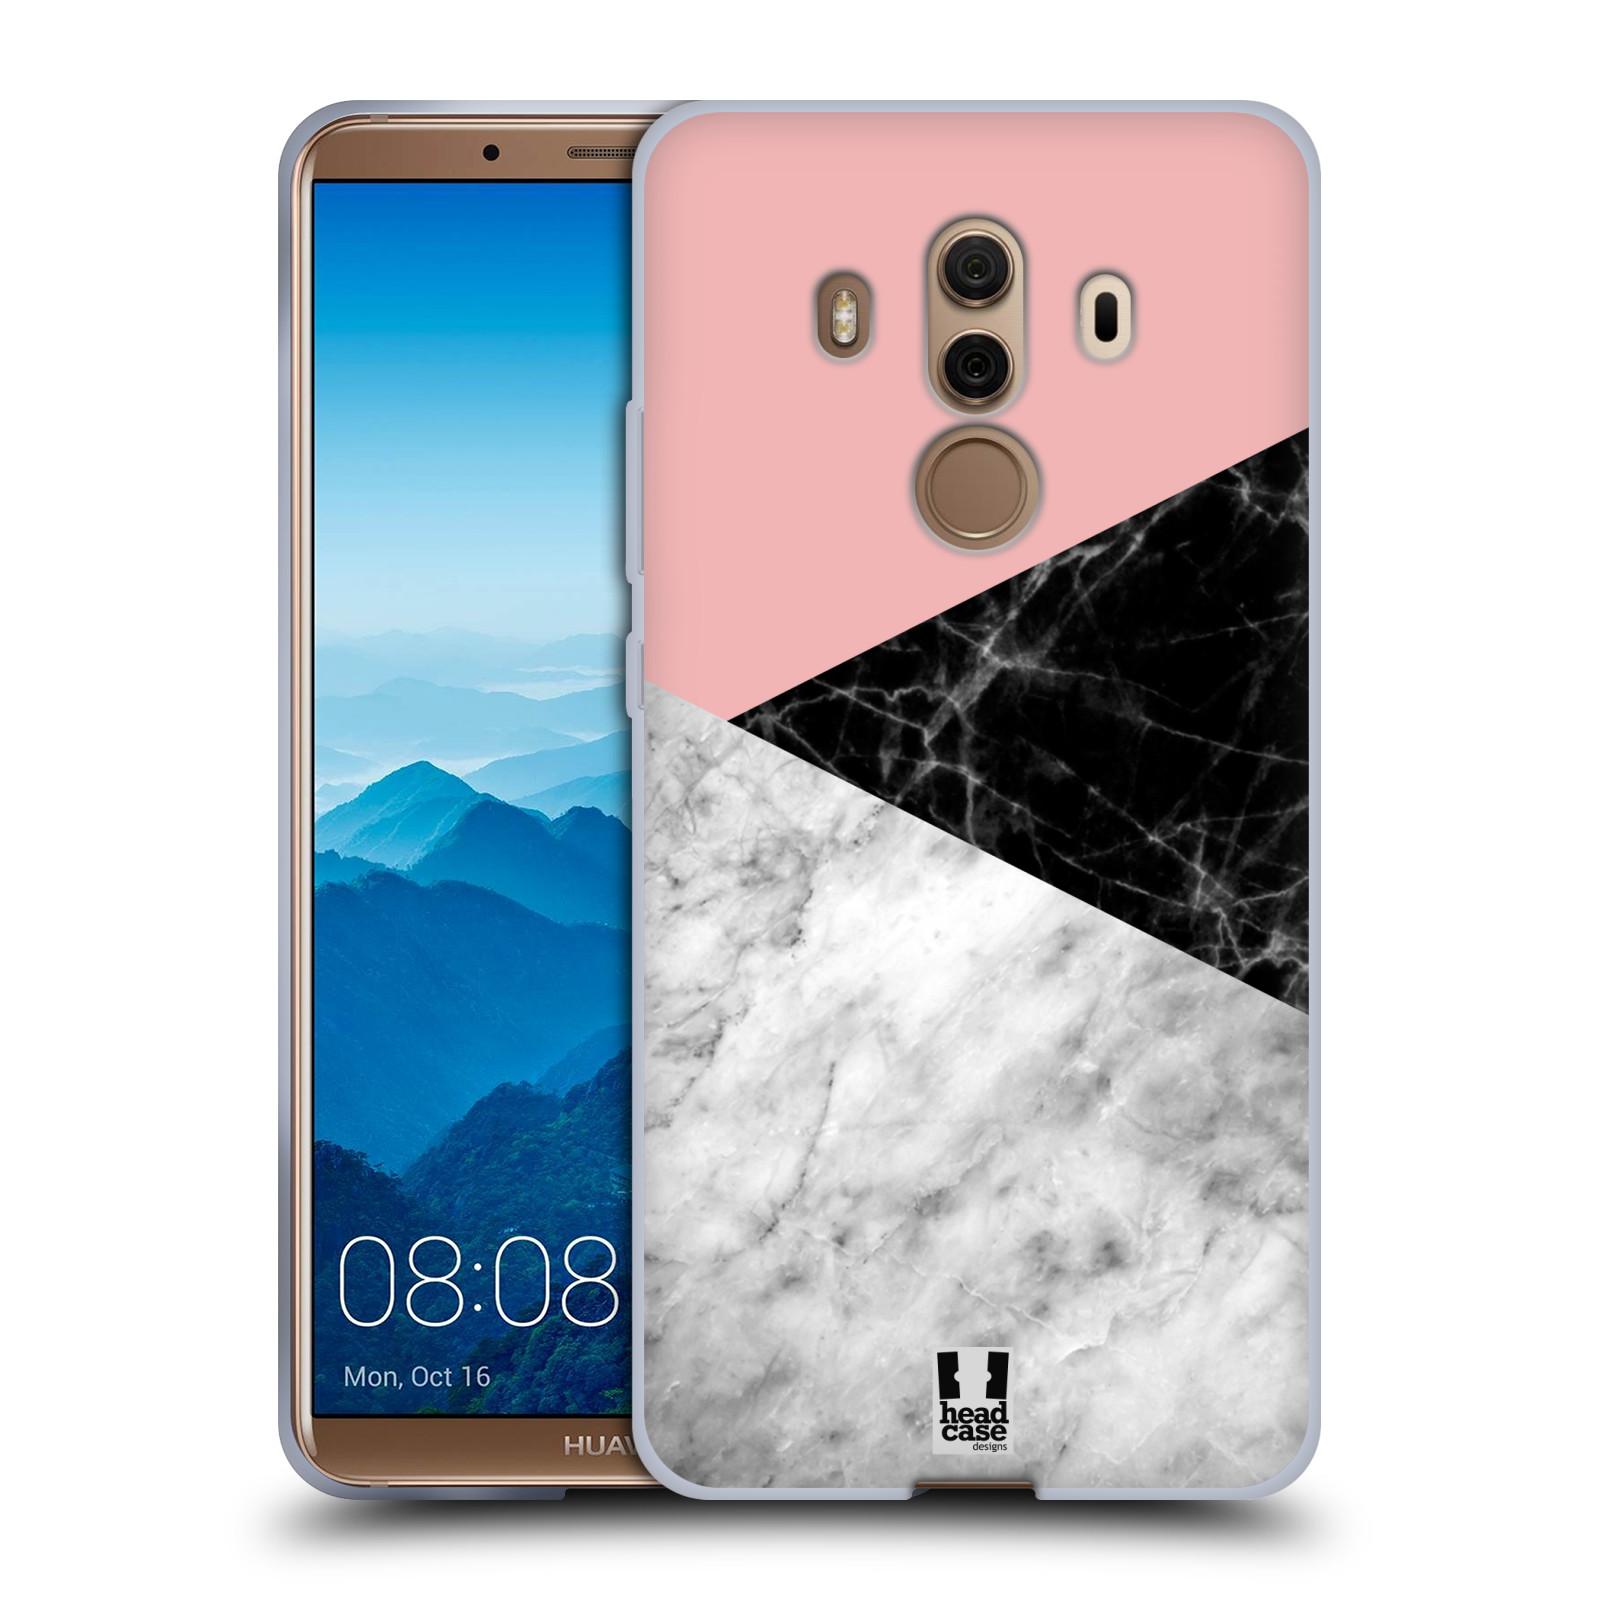 Silikonové pouzdro na mobil Huawei Mate 10 Pro - Head Case - Mramor mix